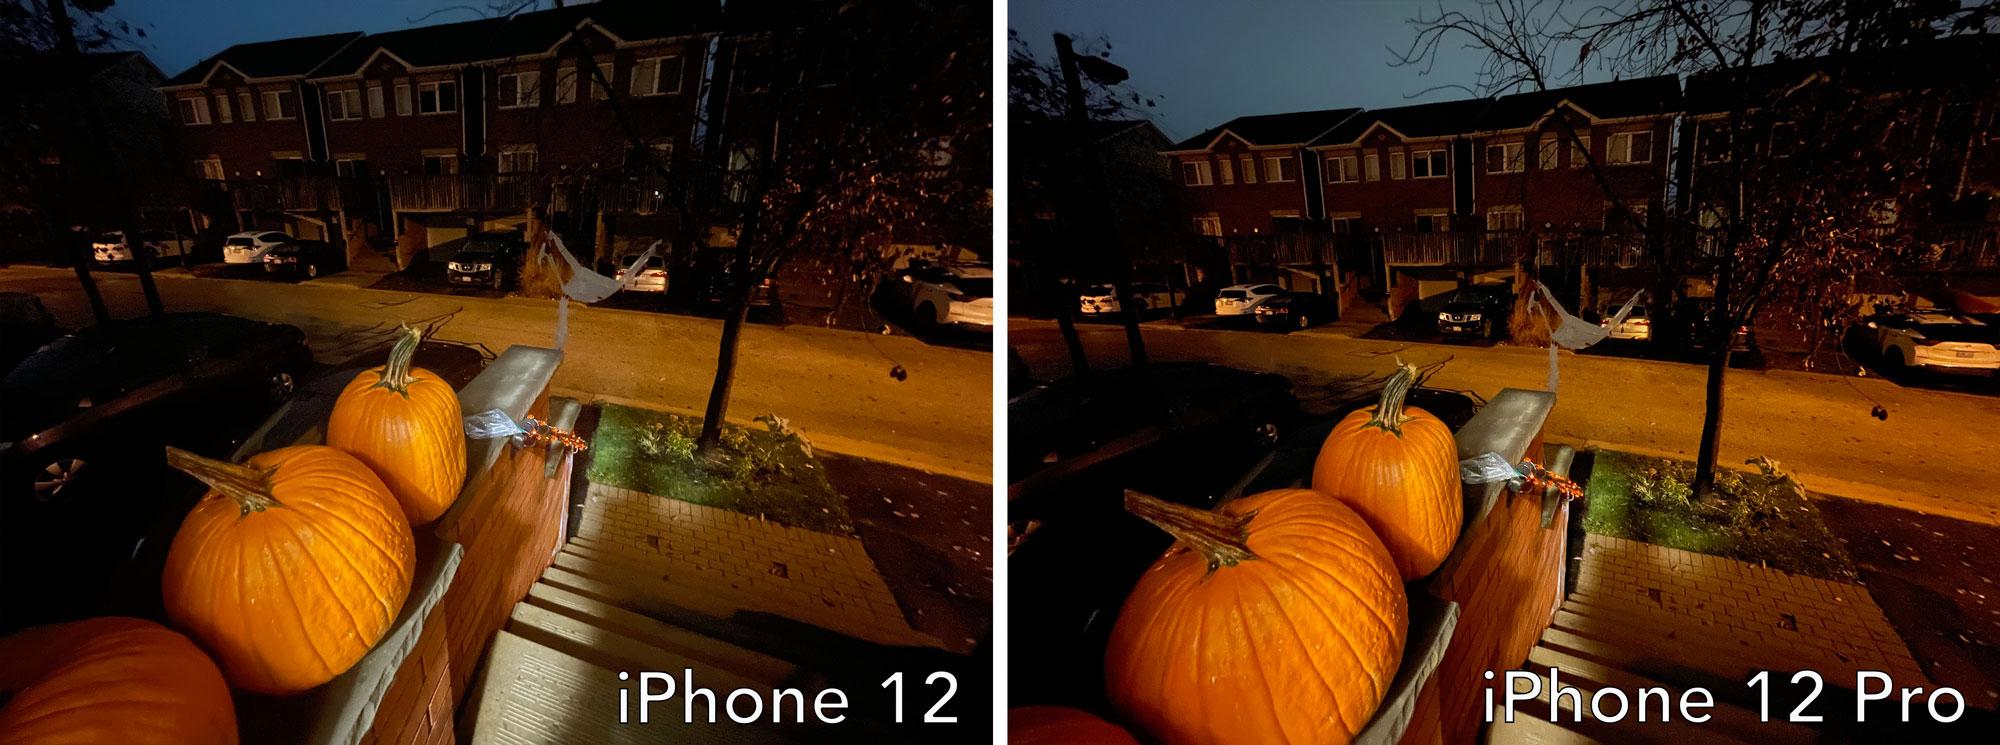 iPhone 12 ultra-wide vs iPhone 12 Pro ultra-wide